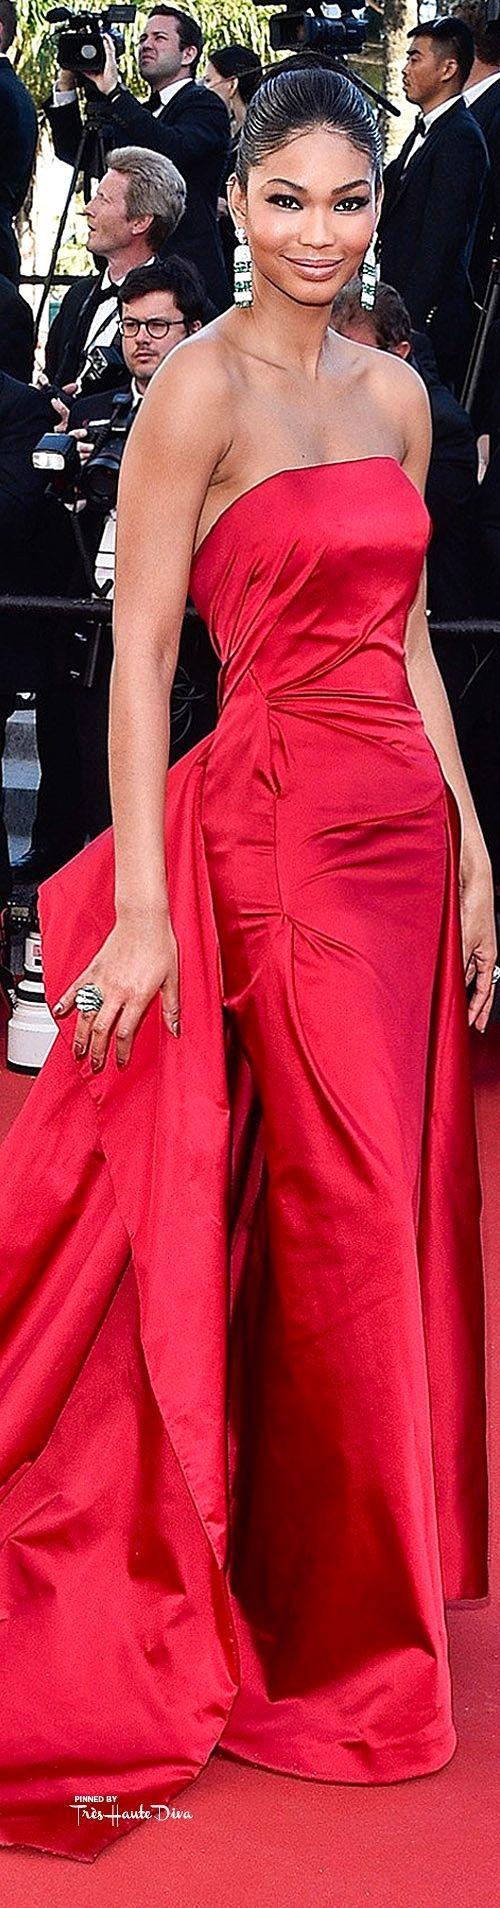 #Chanel #Iman in Donna Karan Atelier ♔ Cannes Film Festival 2015 Red Carpet ♔ Très Haute Diva ♔